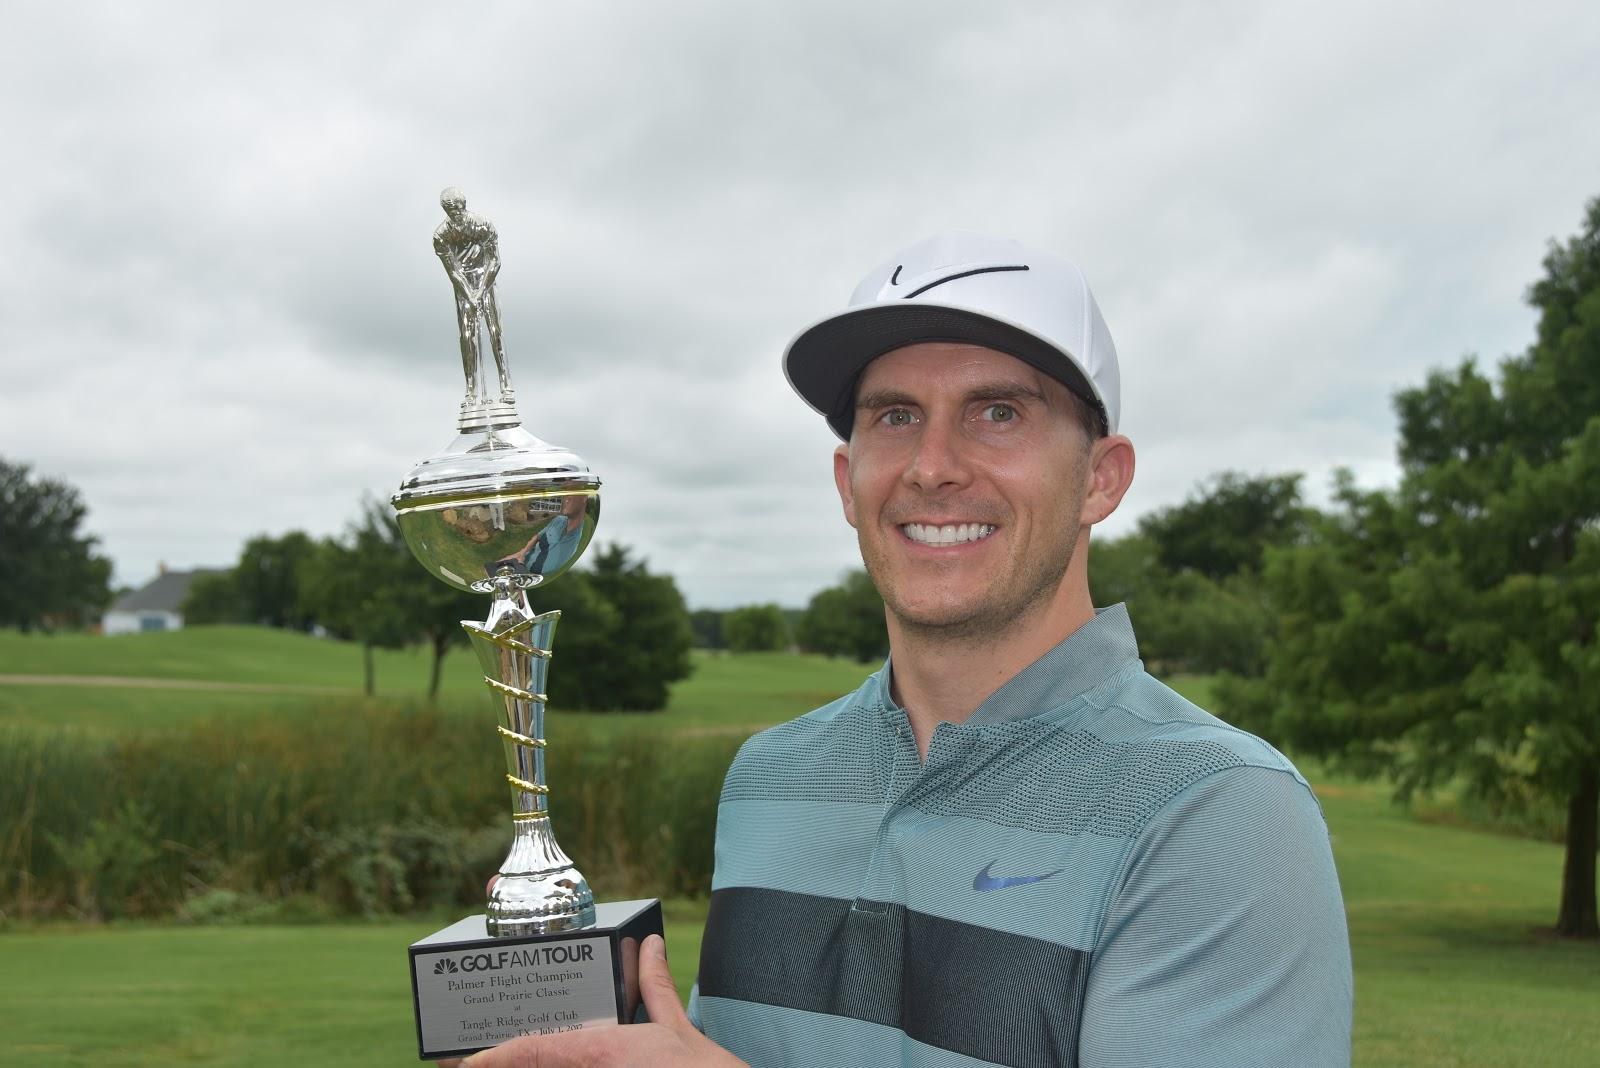 Consider, that Waco texas amateur golf